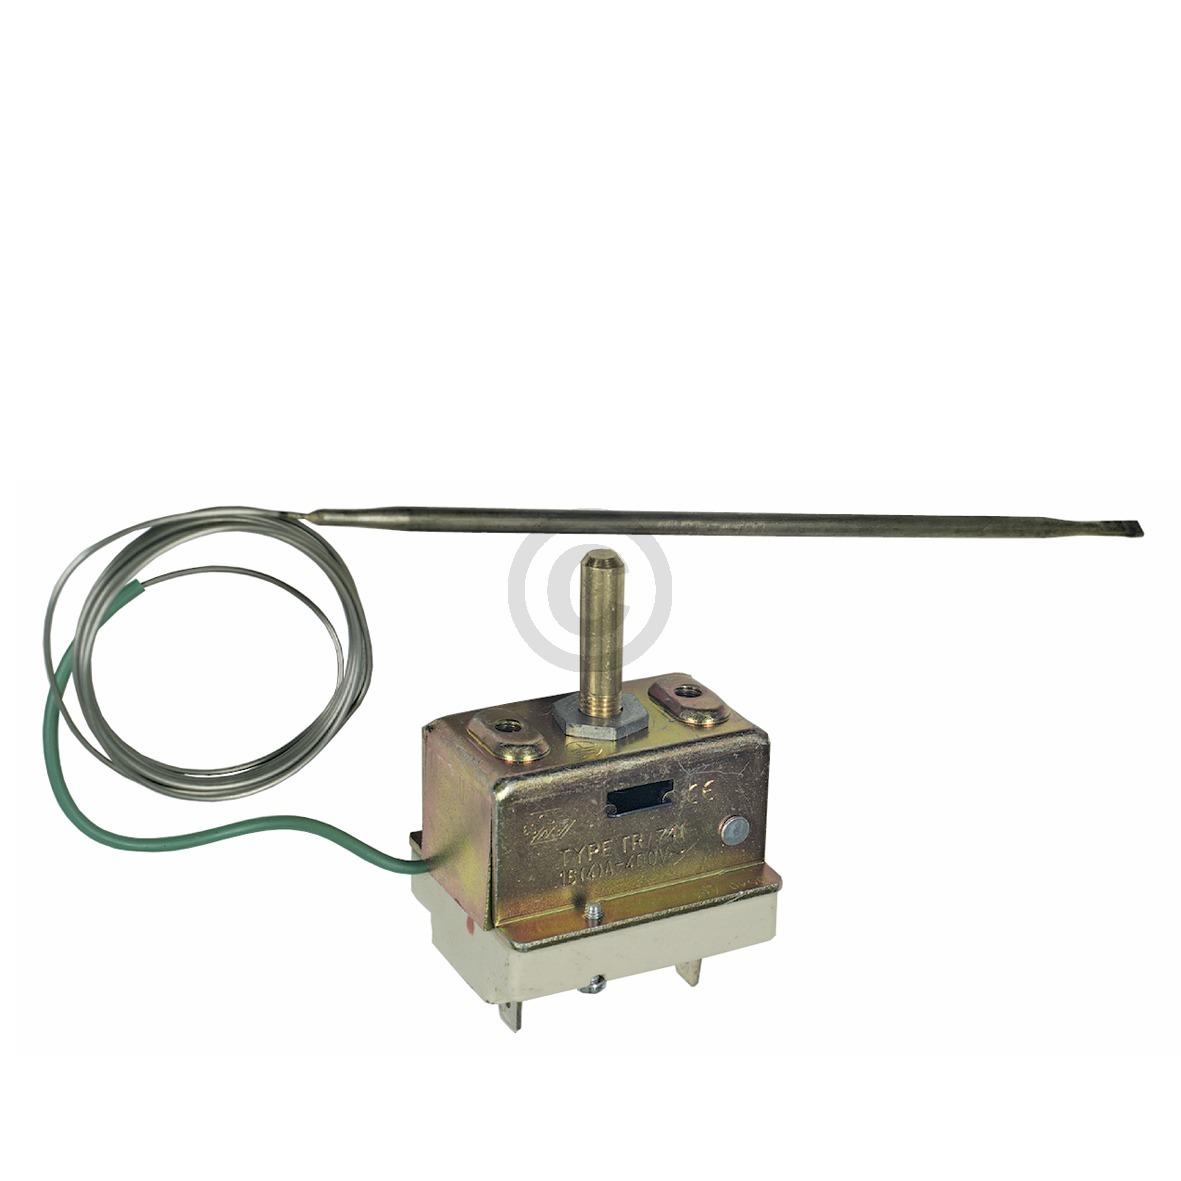 Thermostat TR/741 481928228602 Bauknecht, Whirlpool, Ikea